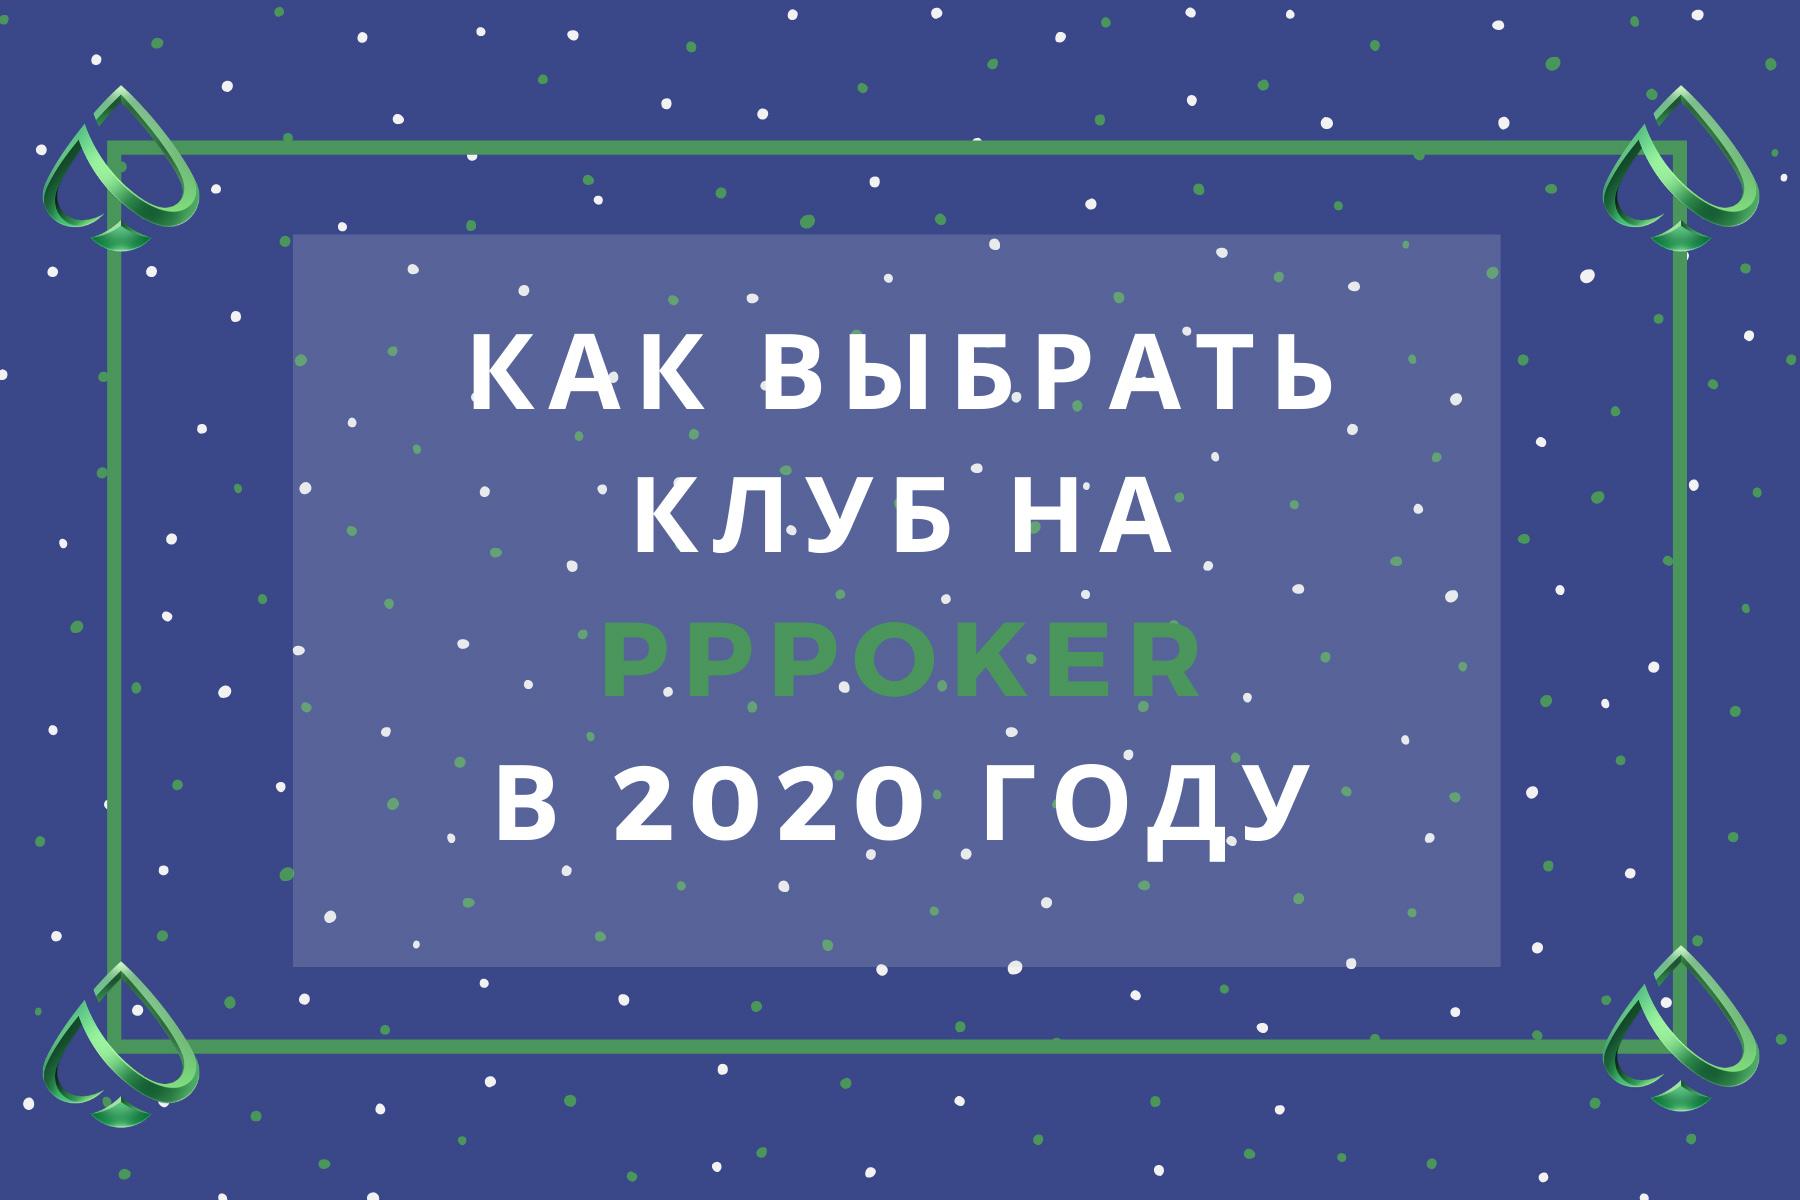 Клубы в руме PPPoker в 2020 году.